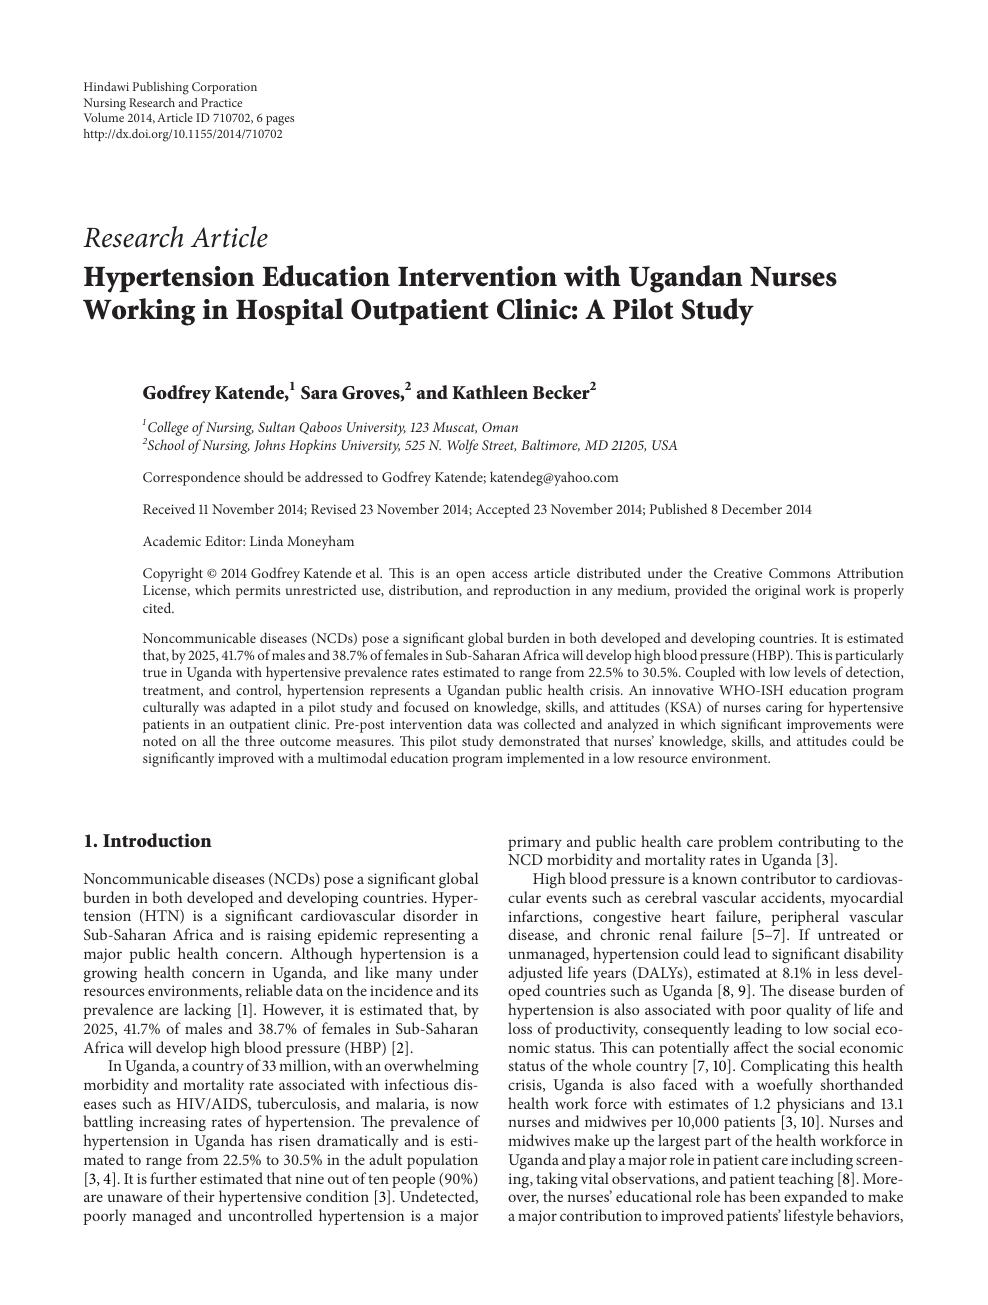 Hypertension Education Intervention with Ugandan Nurses Working in